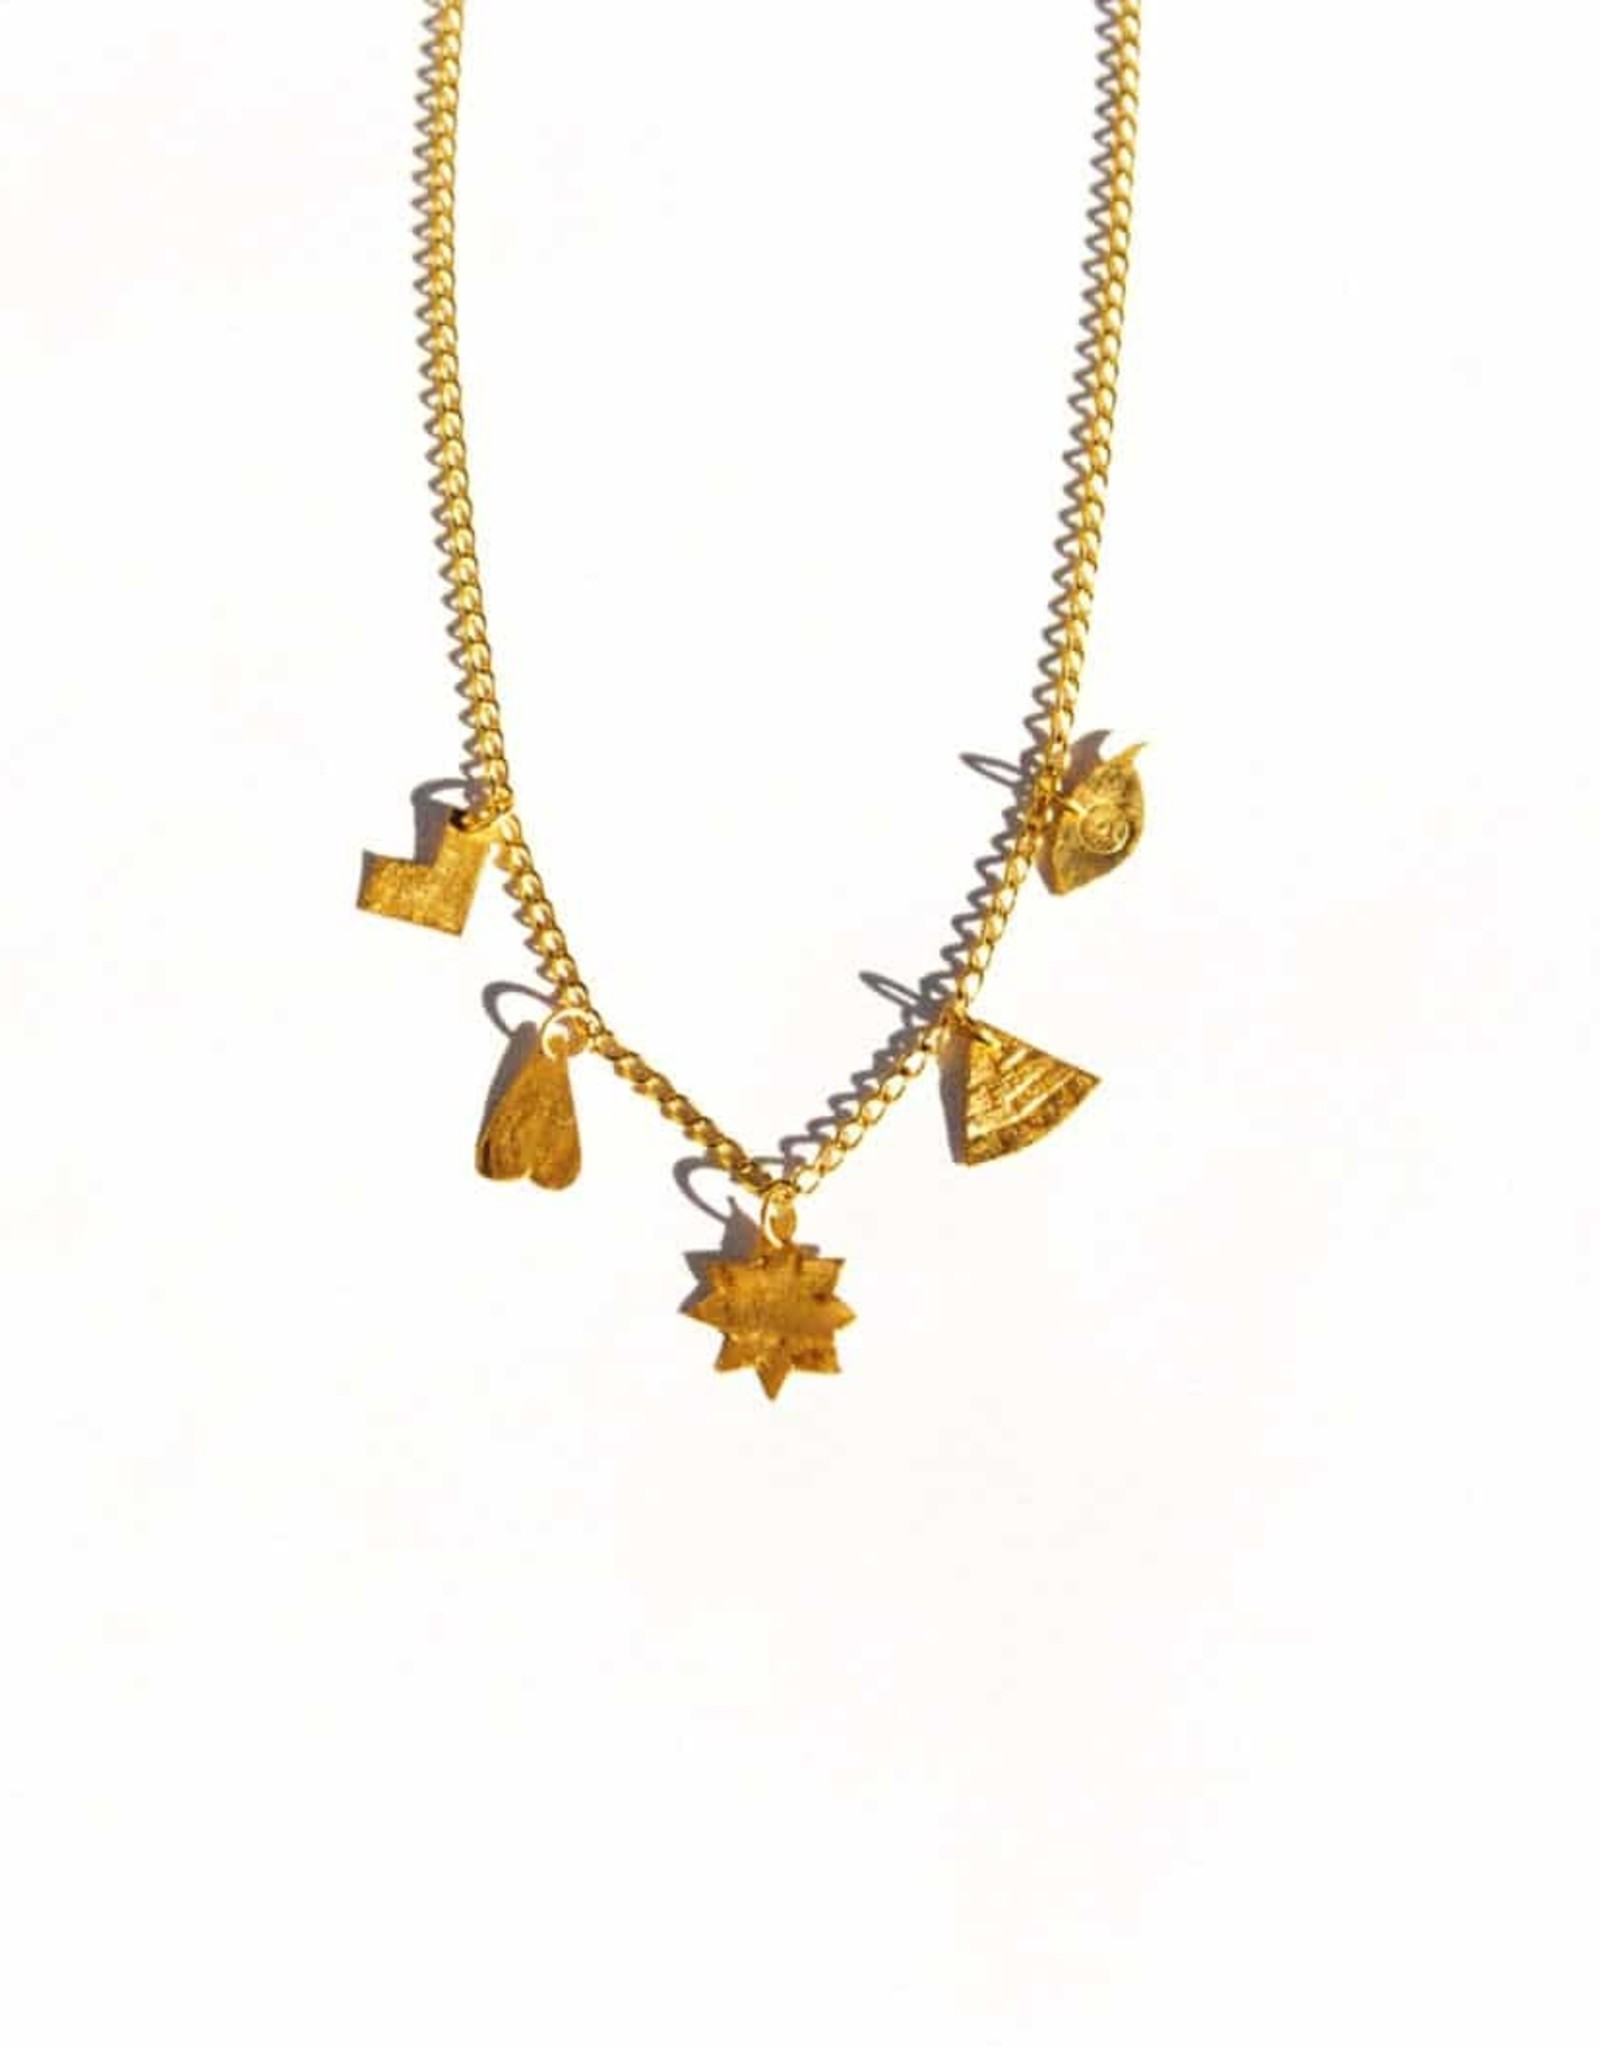 Après Ski Beyaz necklace